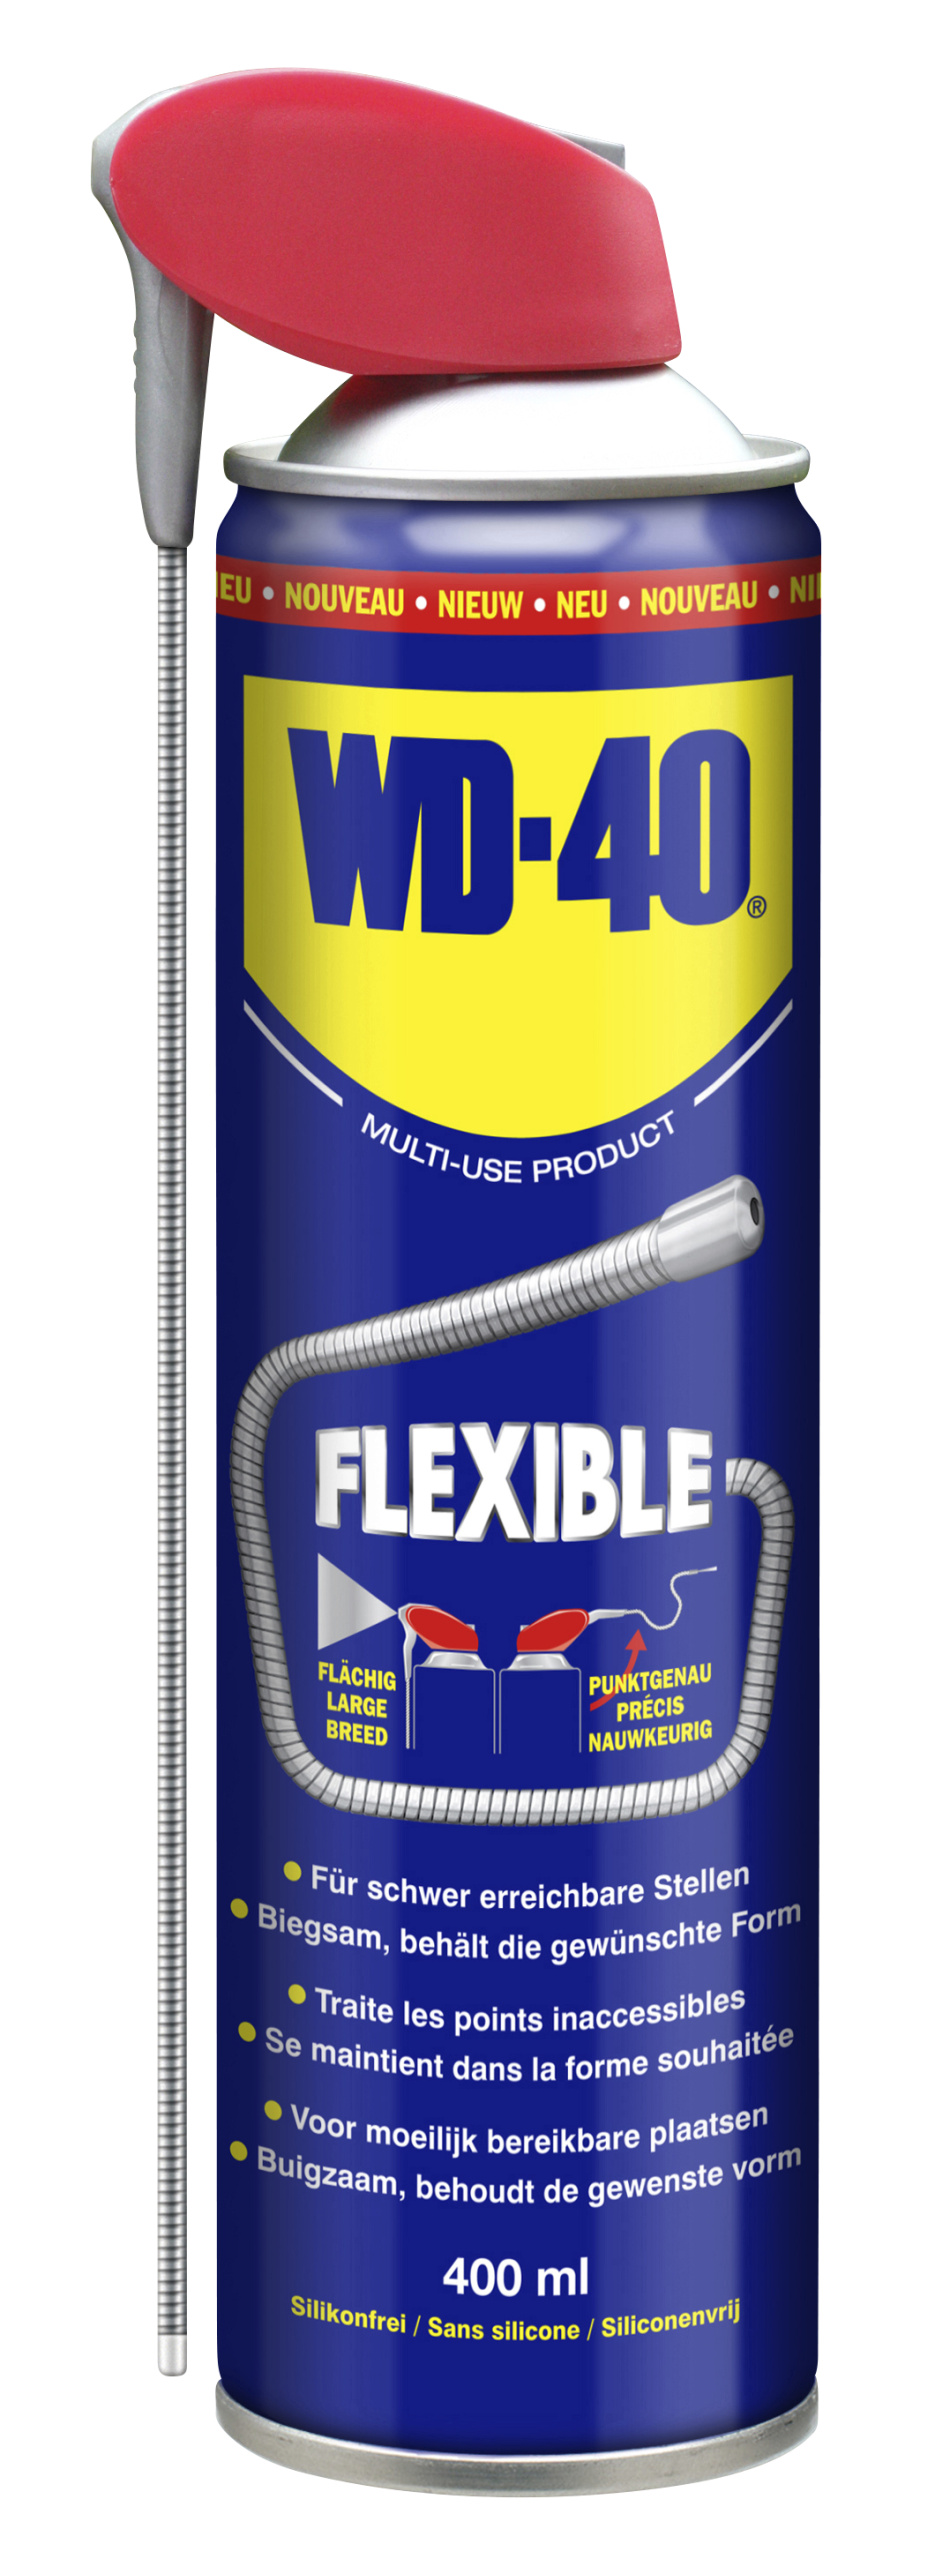 WD-40 Flexible Sprühdose 400ml